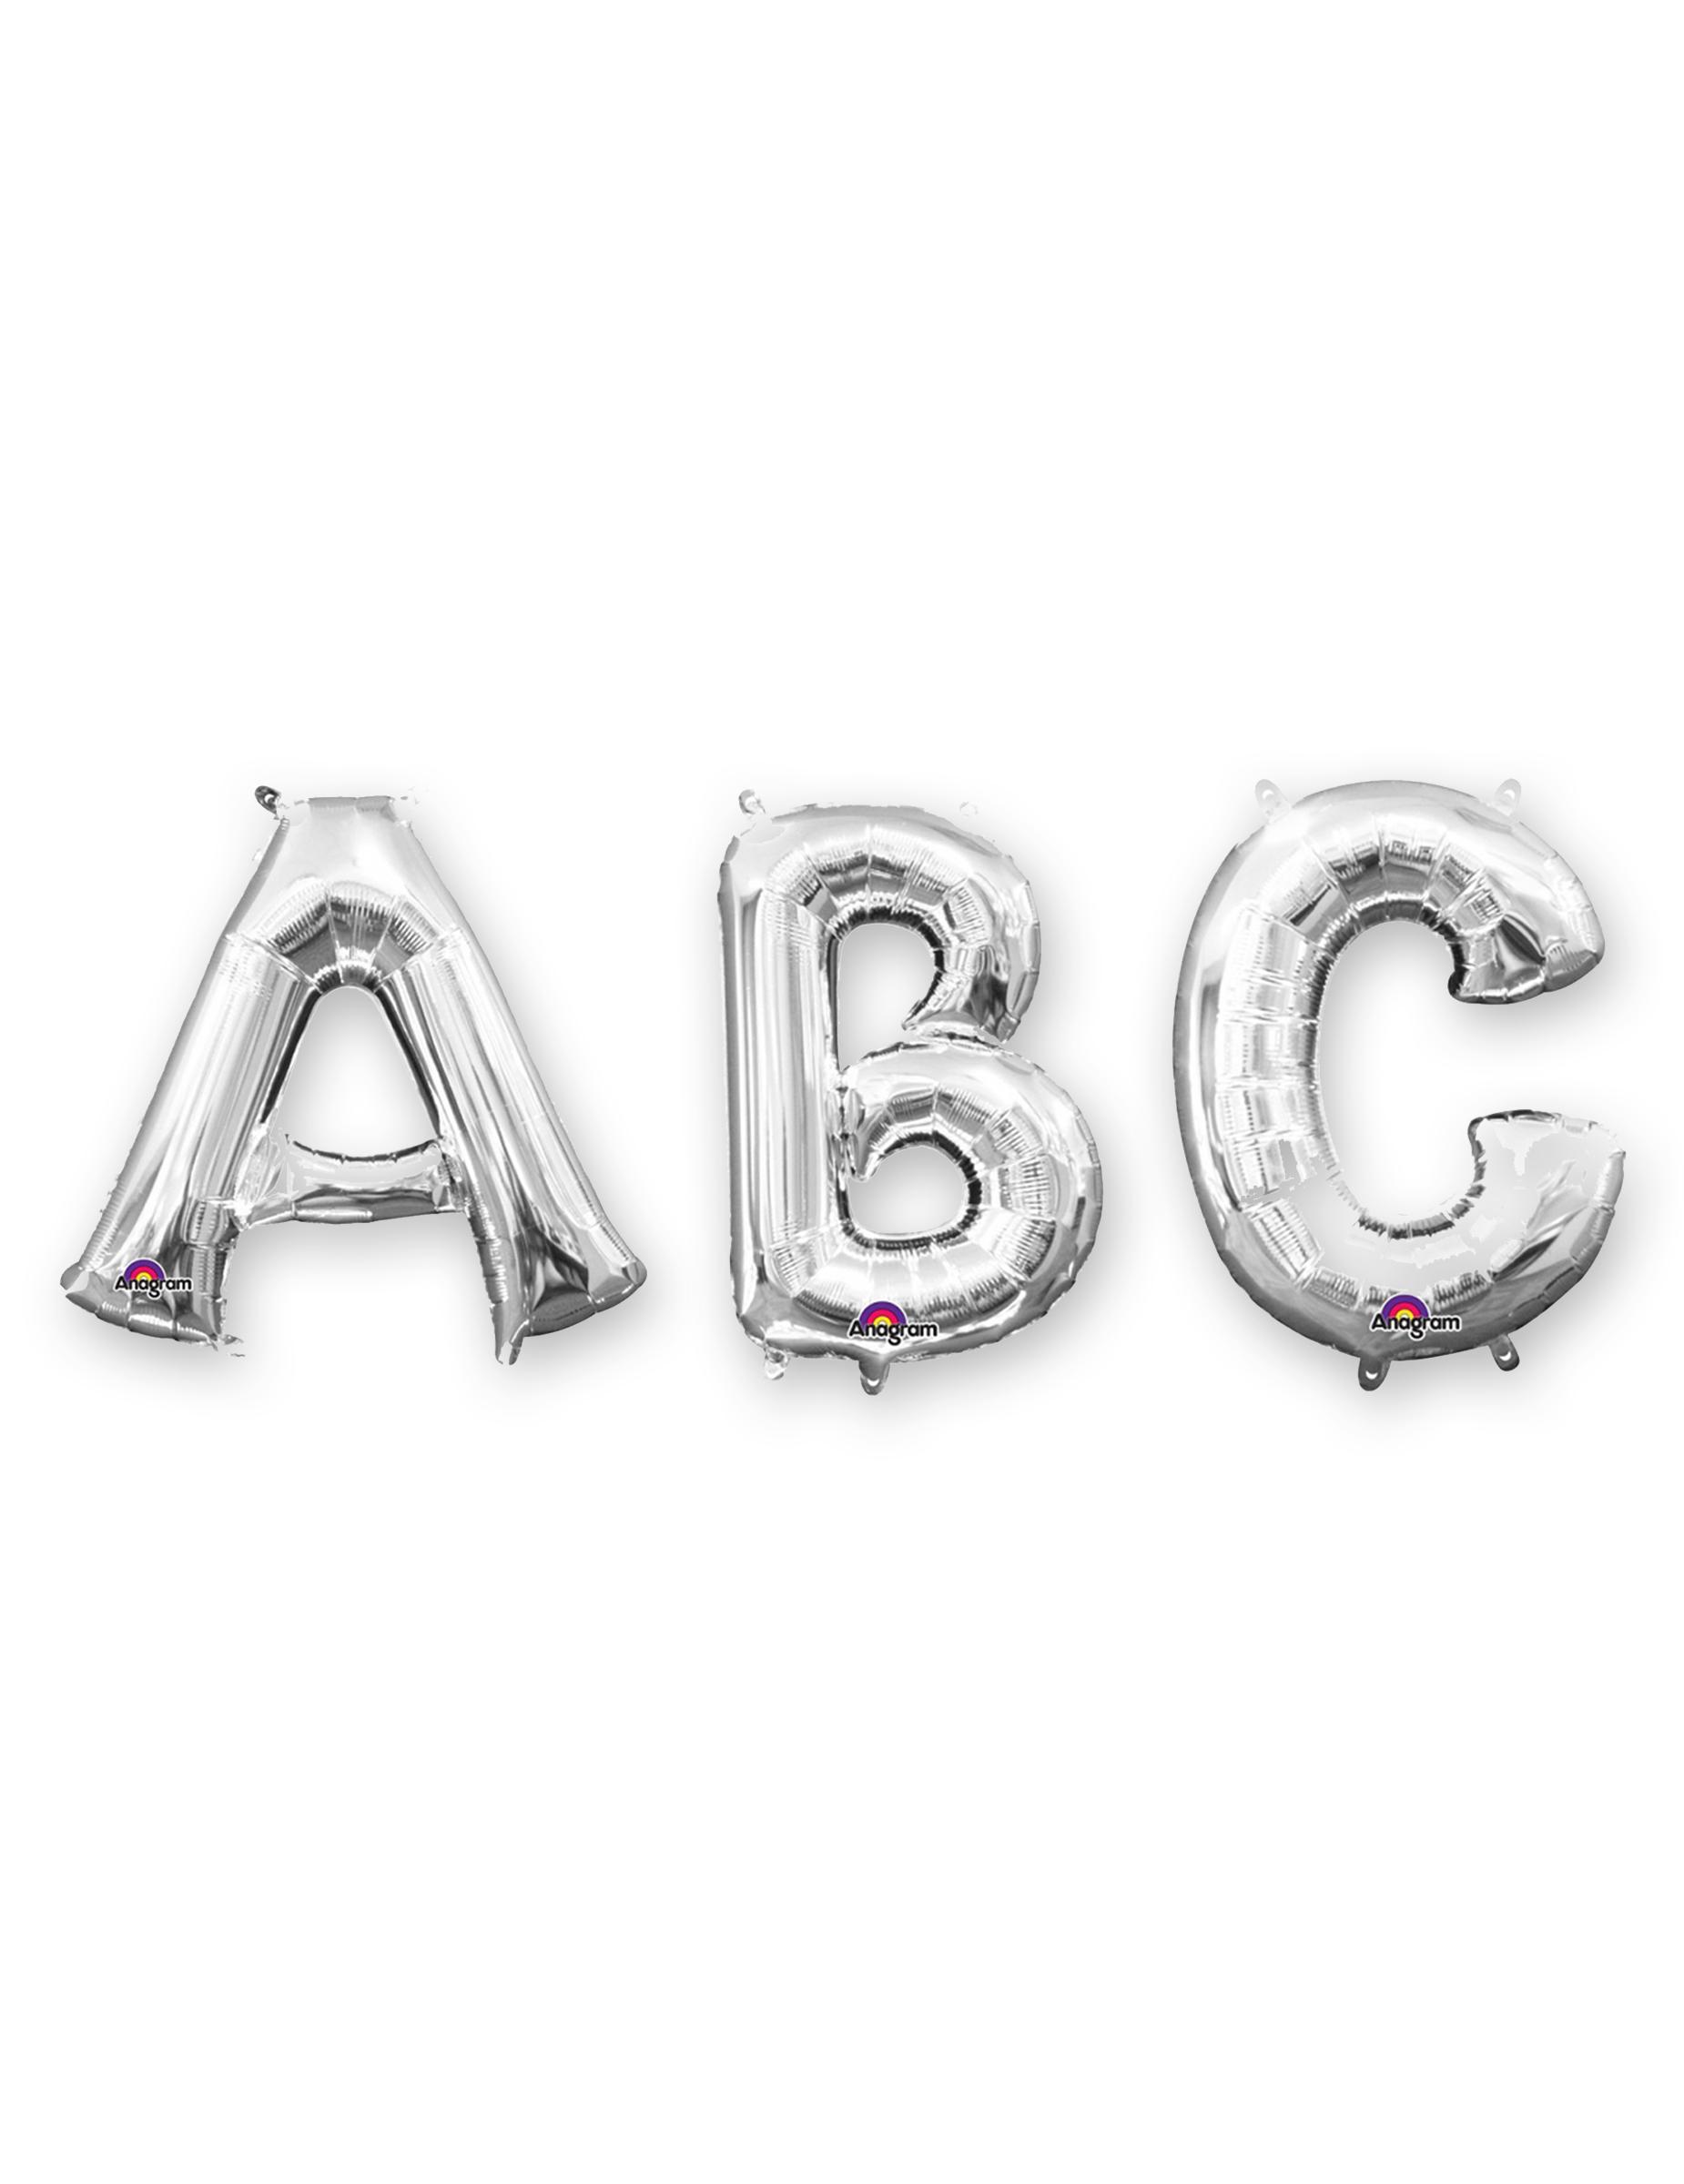 #Aluminium-Ballon Buchstaben Partydekoration silber 33 cm#